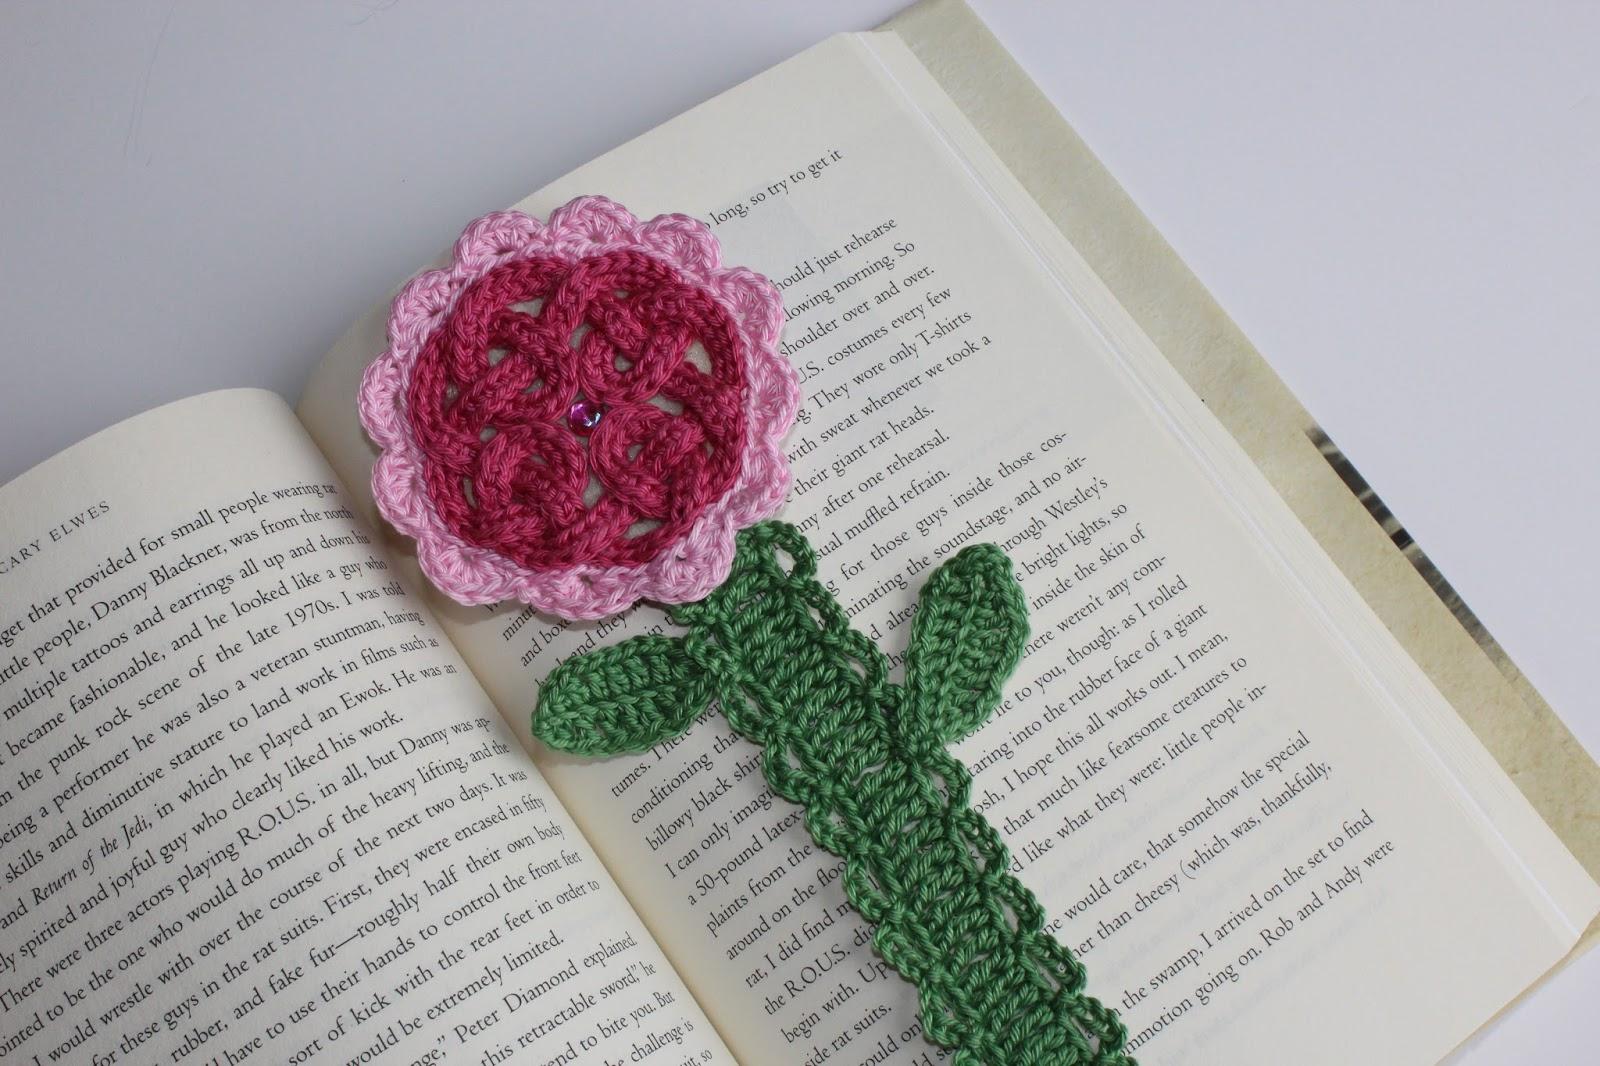 Celtic Knot Crochet Crochetville And The Crochet Express